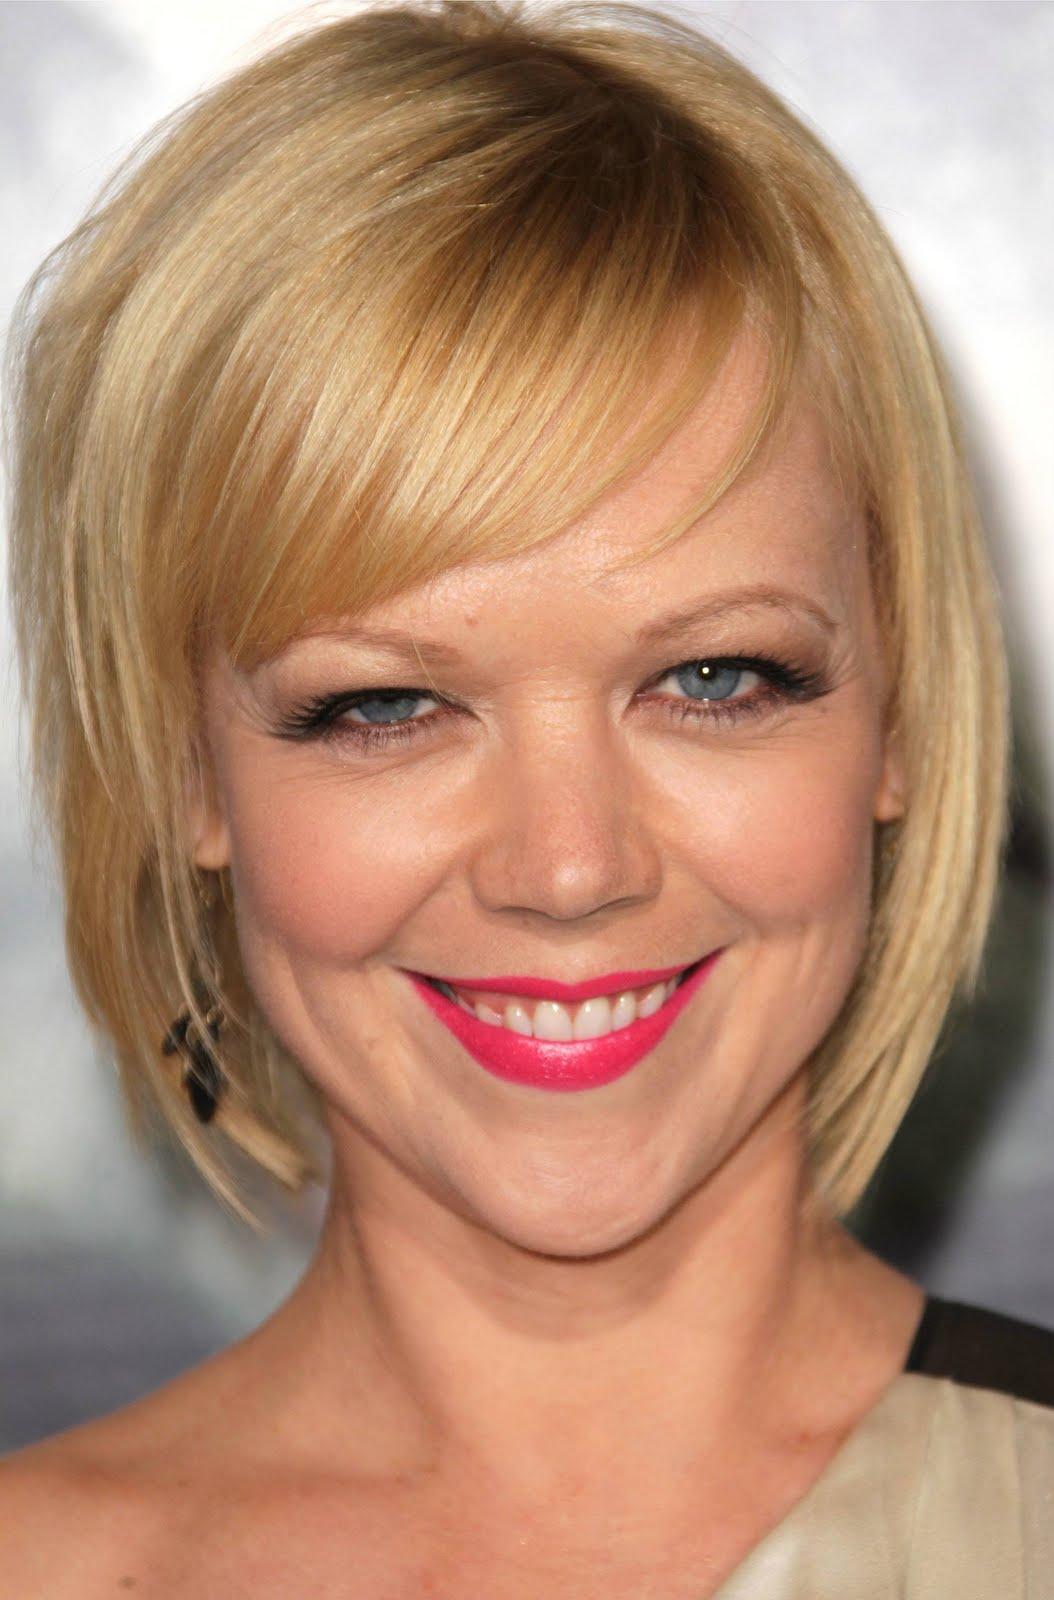 Kafgallery Celebrity New Shag Hairstyles Of 2012